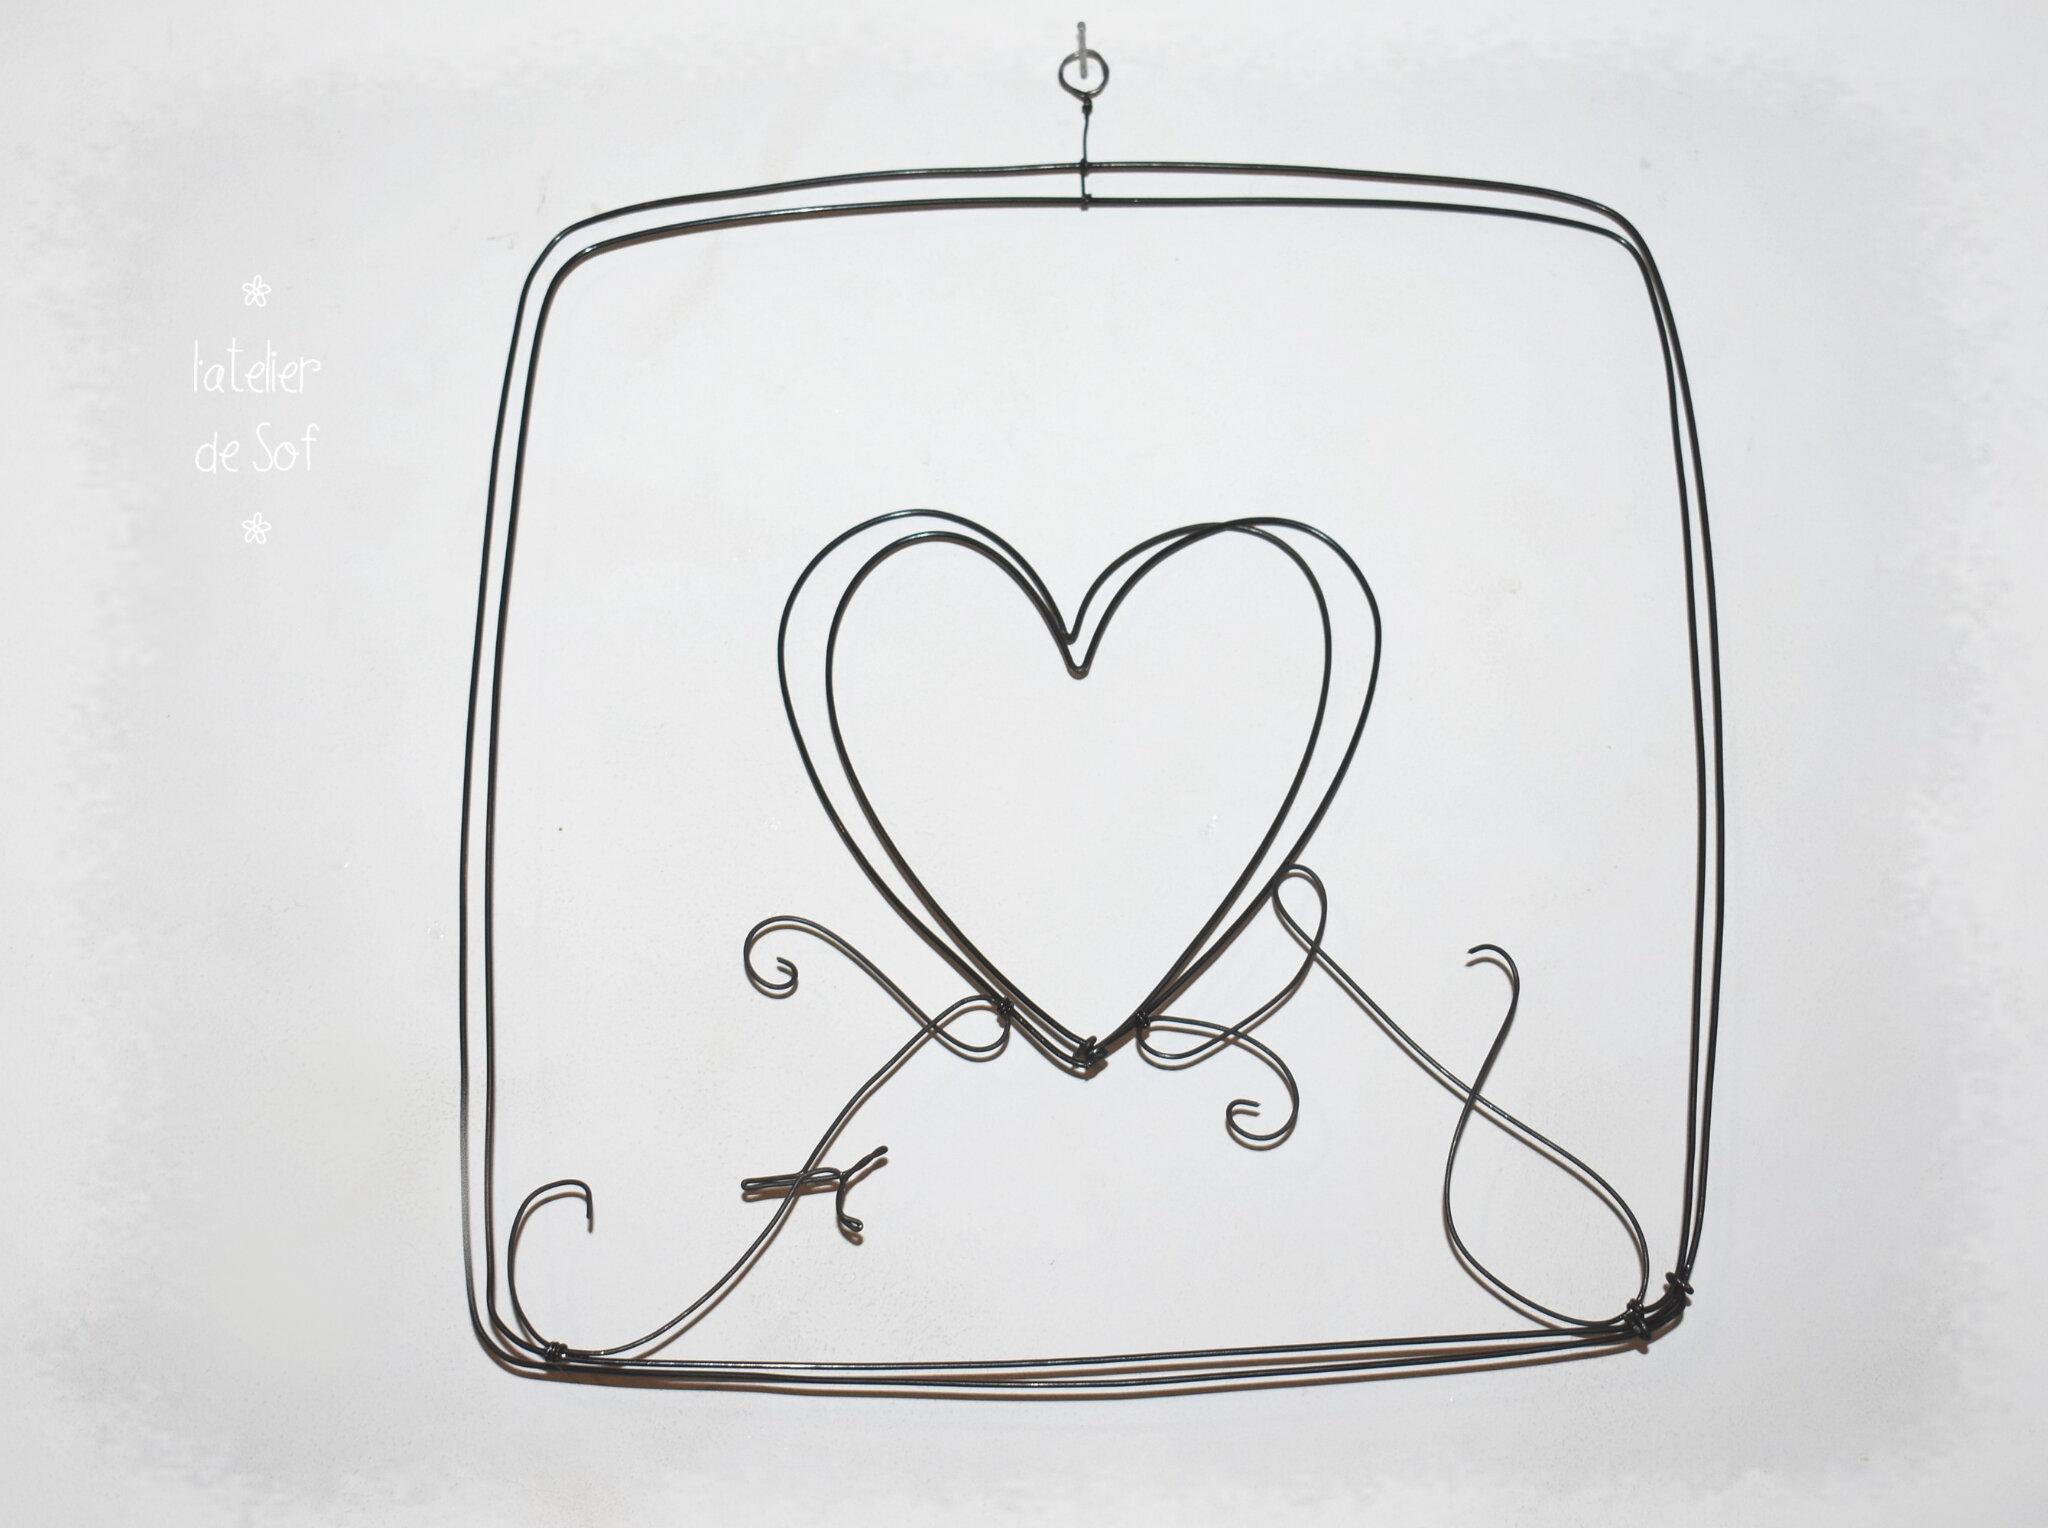 initiales dans un coeur- fil de fer